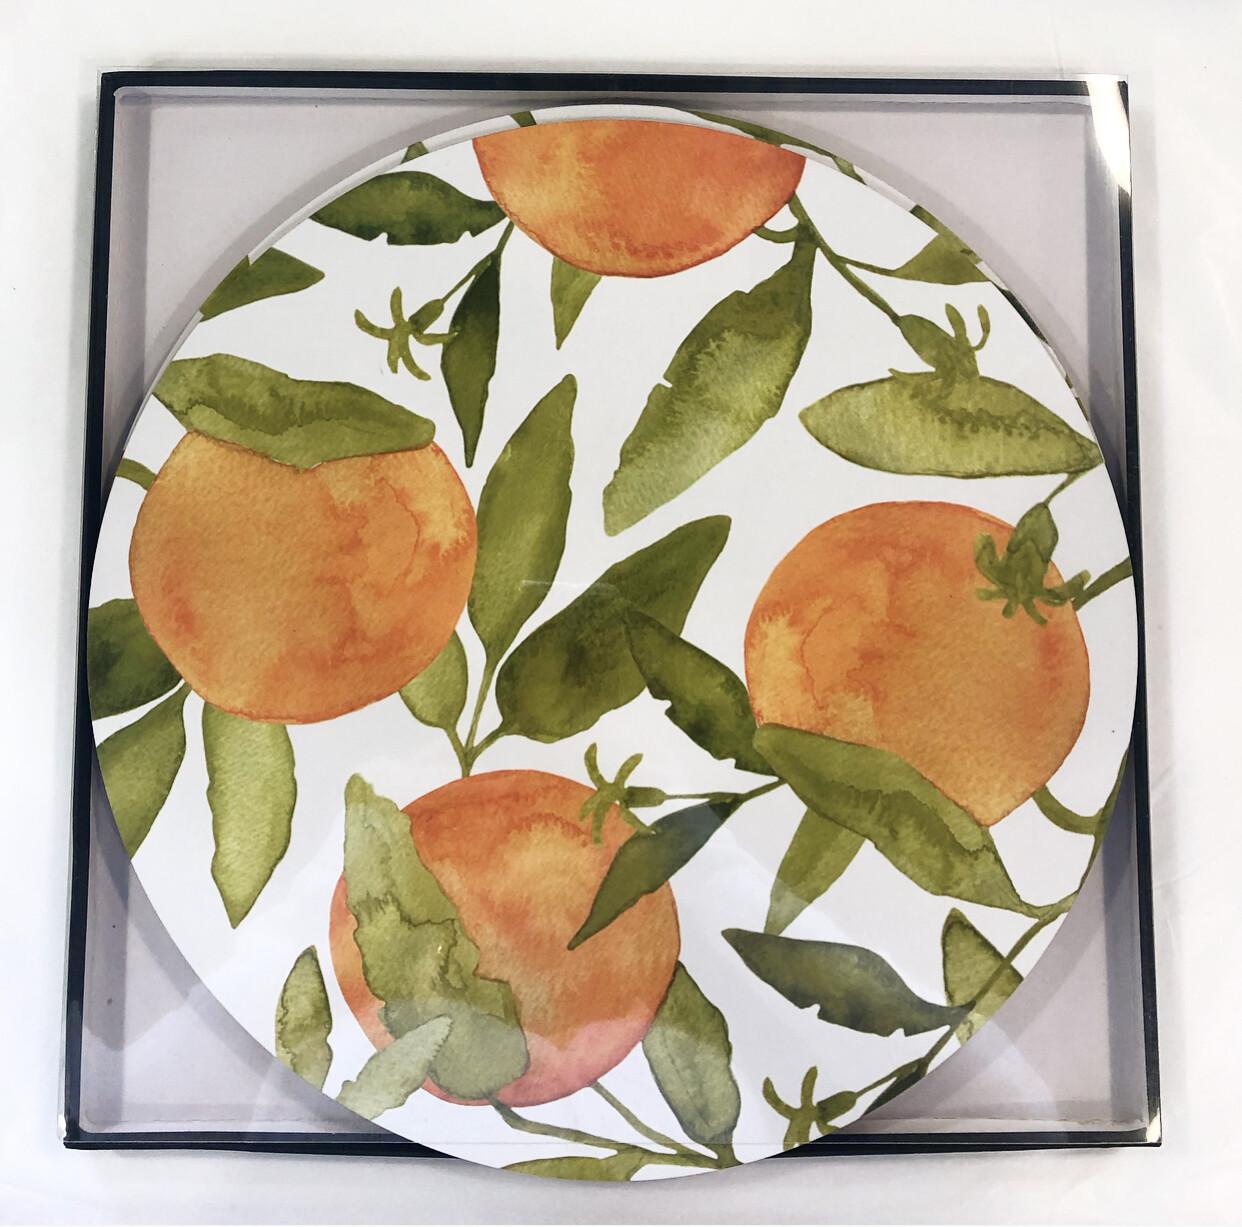 MADRAS LINK -  Oranges Round Placemats Set x 4  33 x 33cm